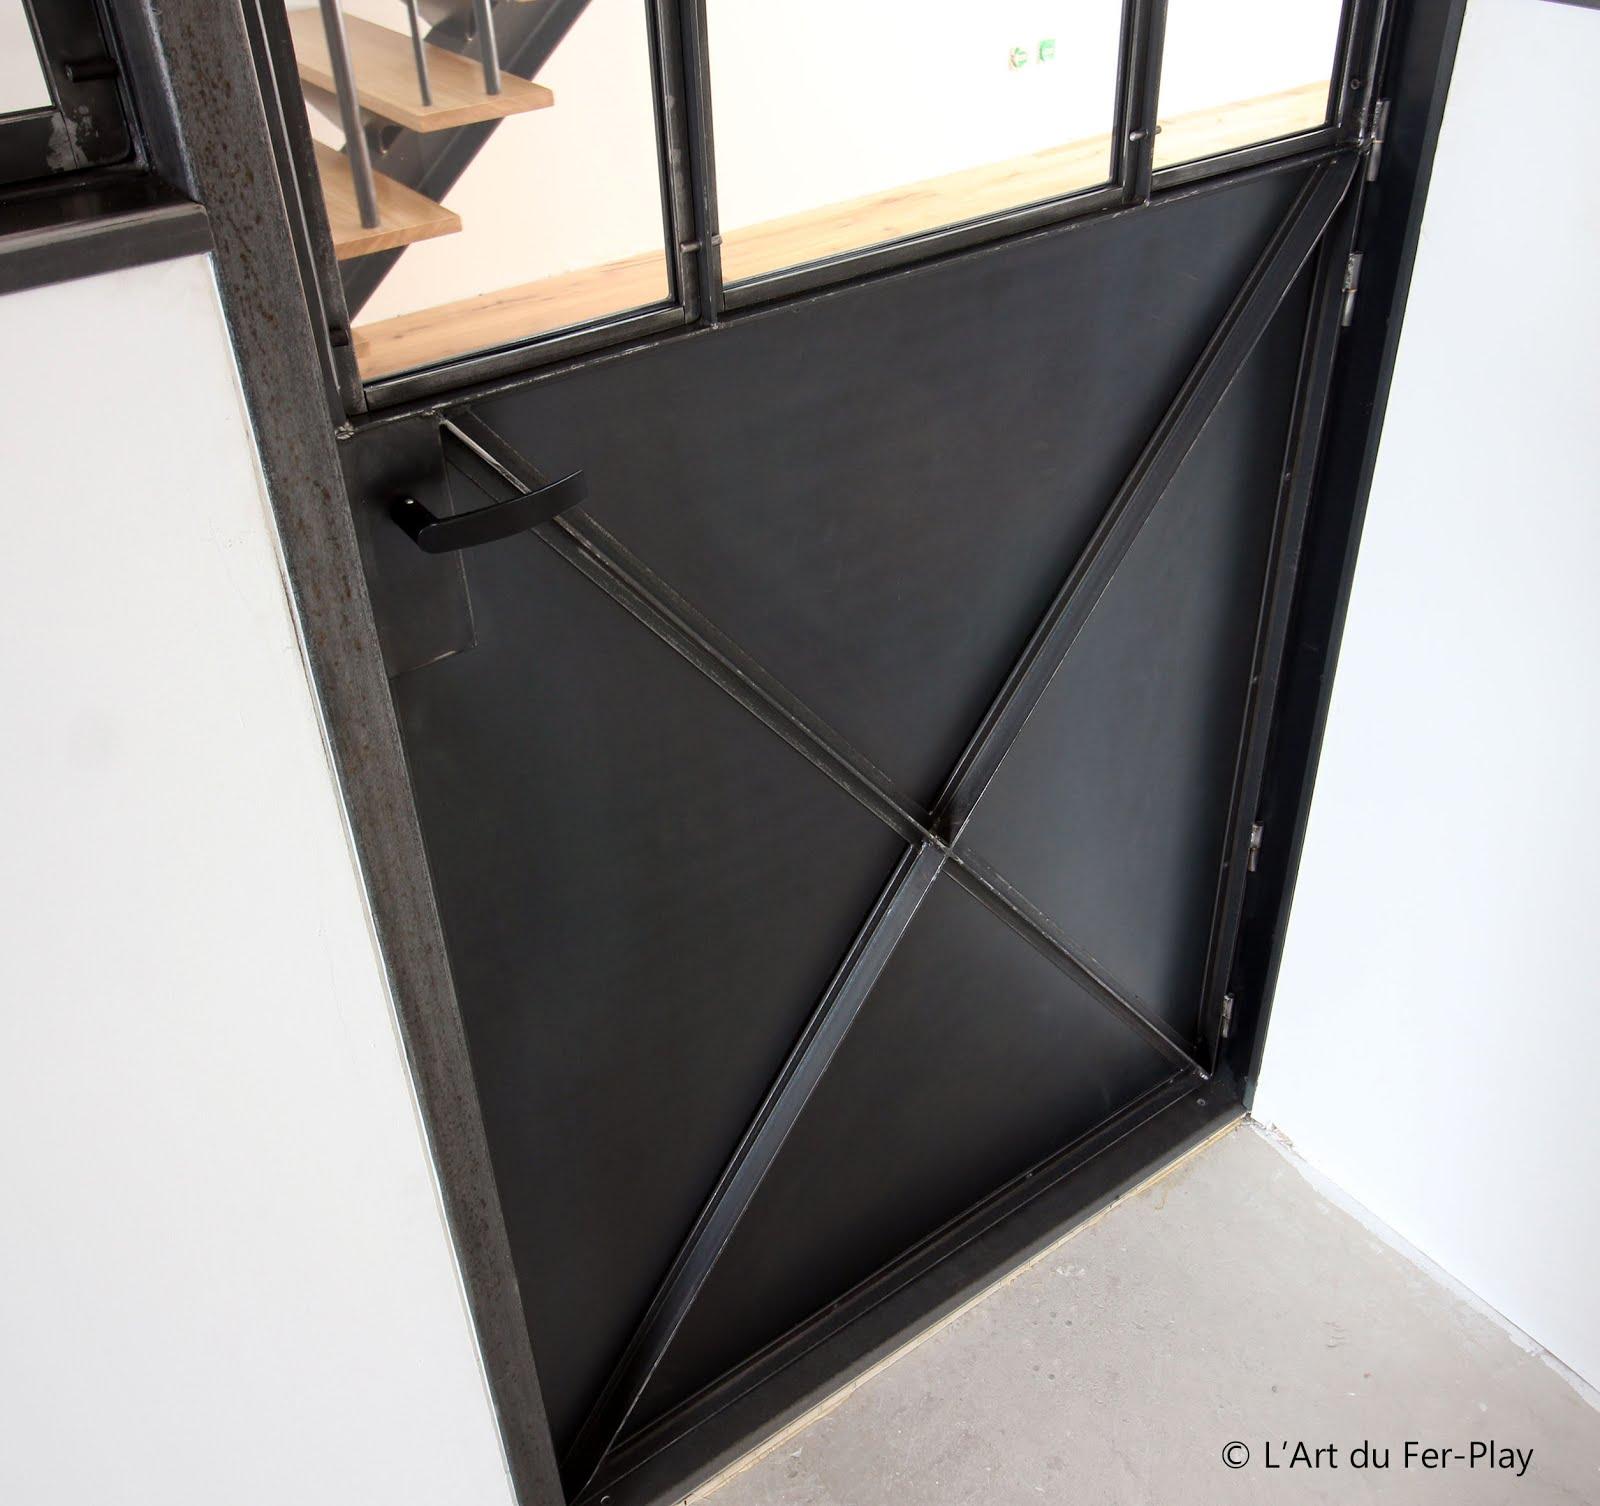 ferronnerie m tallerie serrurerie 79 deux s vres l 39 art du fer play porte battante type atelier. Black Bedroom Furniture Sets. Home Design Ideas